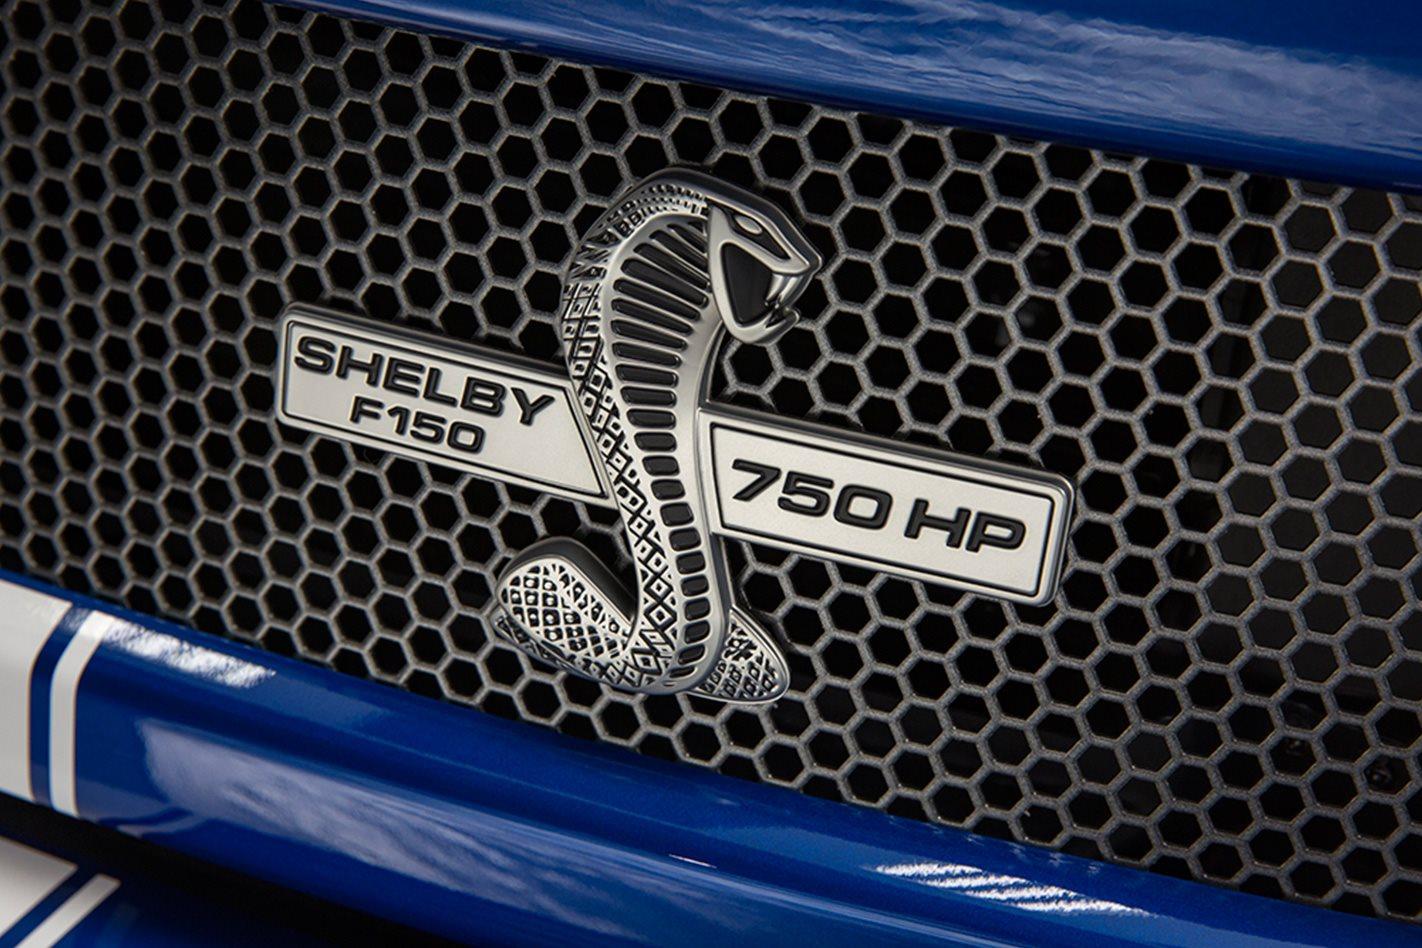 Shelby F 150 Super Snake  badge